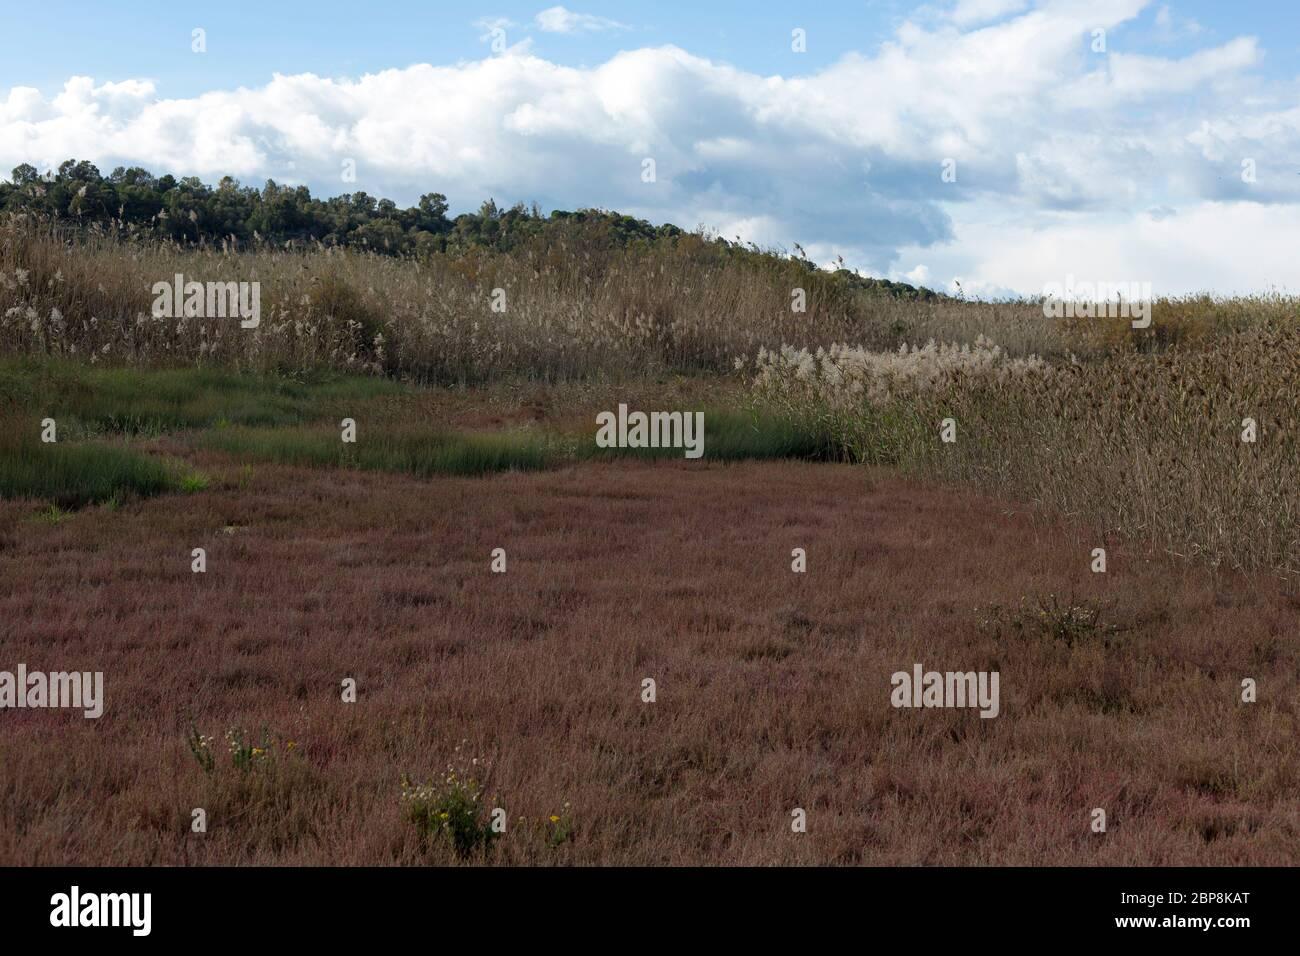 La reserva natural del parque del río Alcantara, Sicilia, Italia Foto de stock